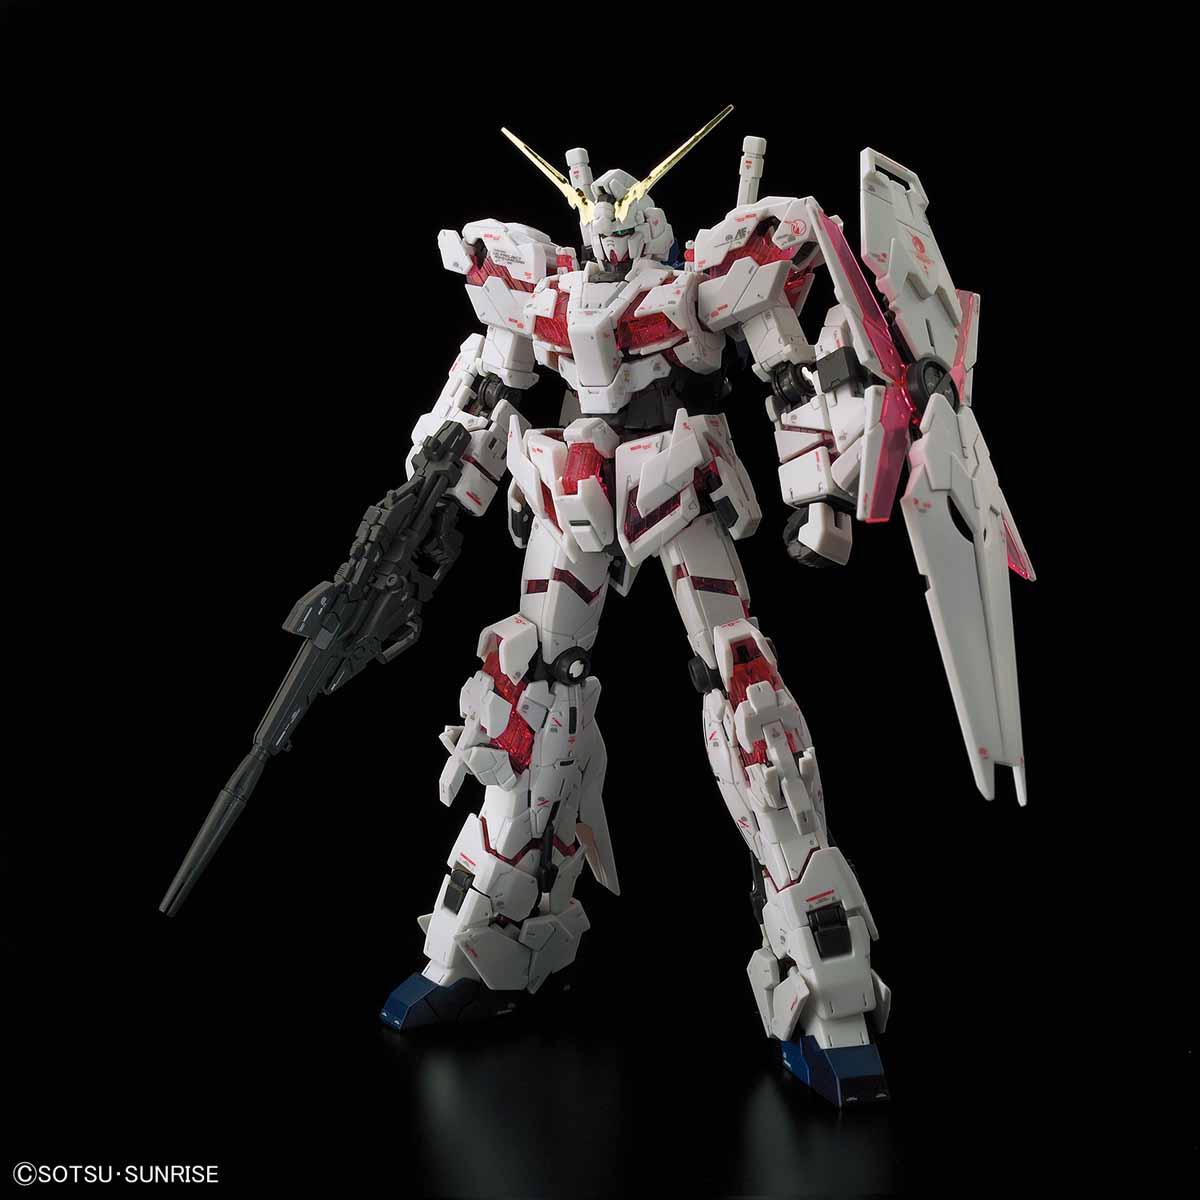 RG 1/144 RX-0 ユニコーンガンダム [Unicorn Gundam] 4549660167419 0216741